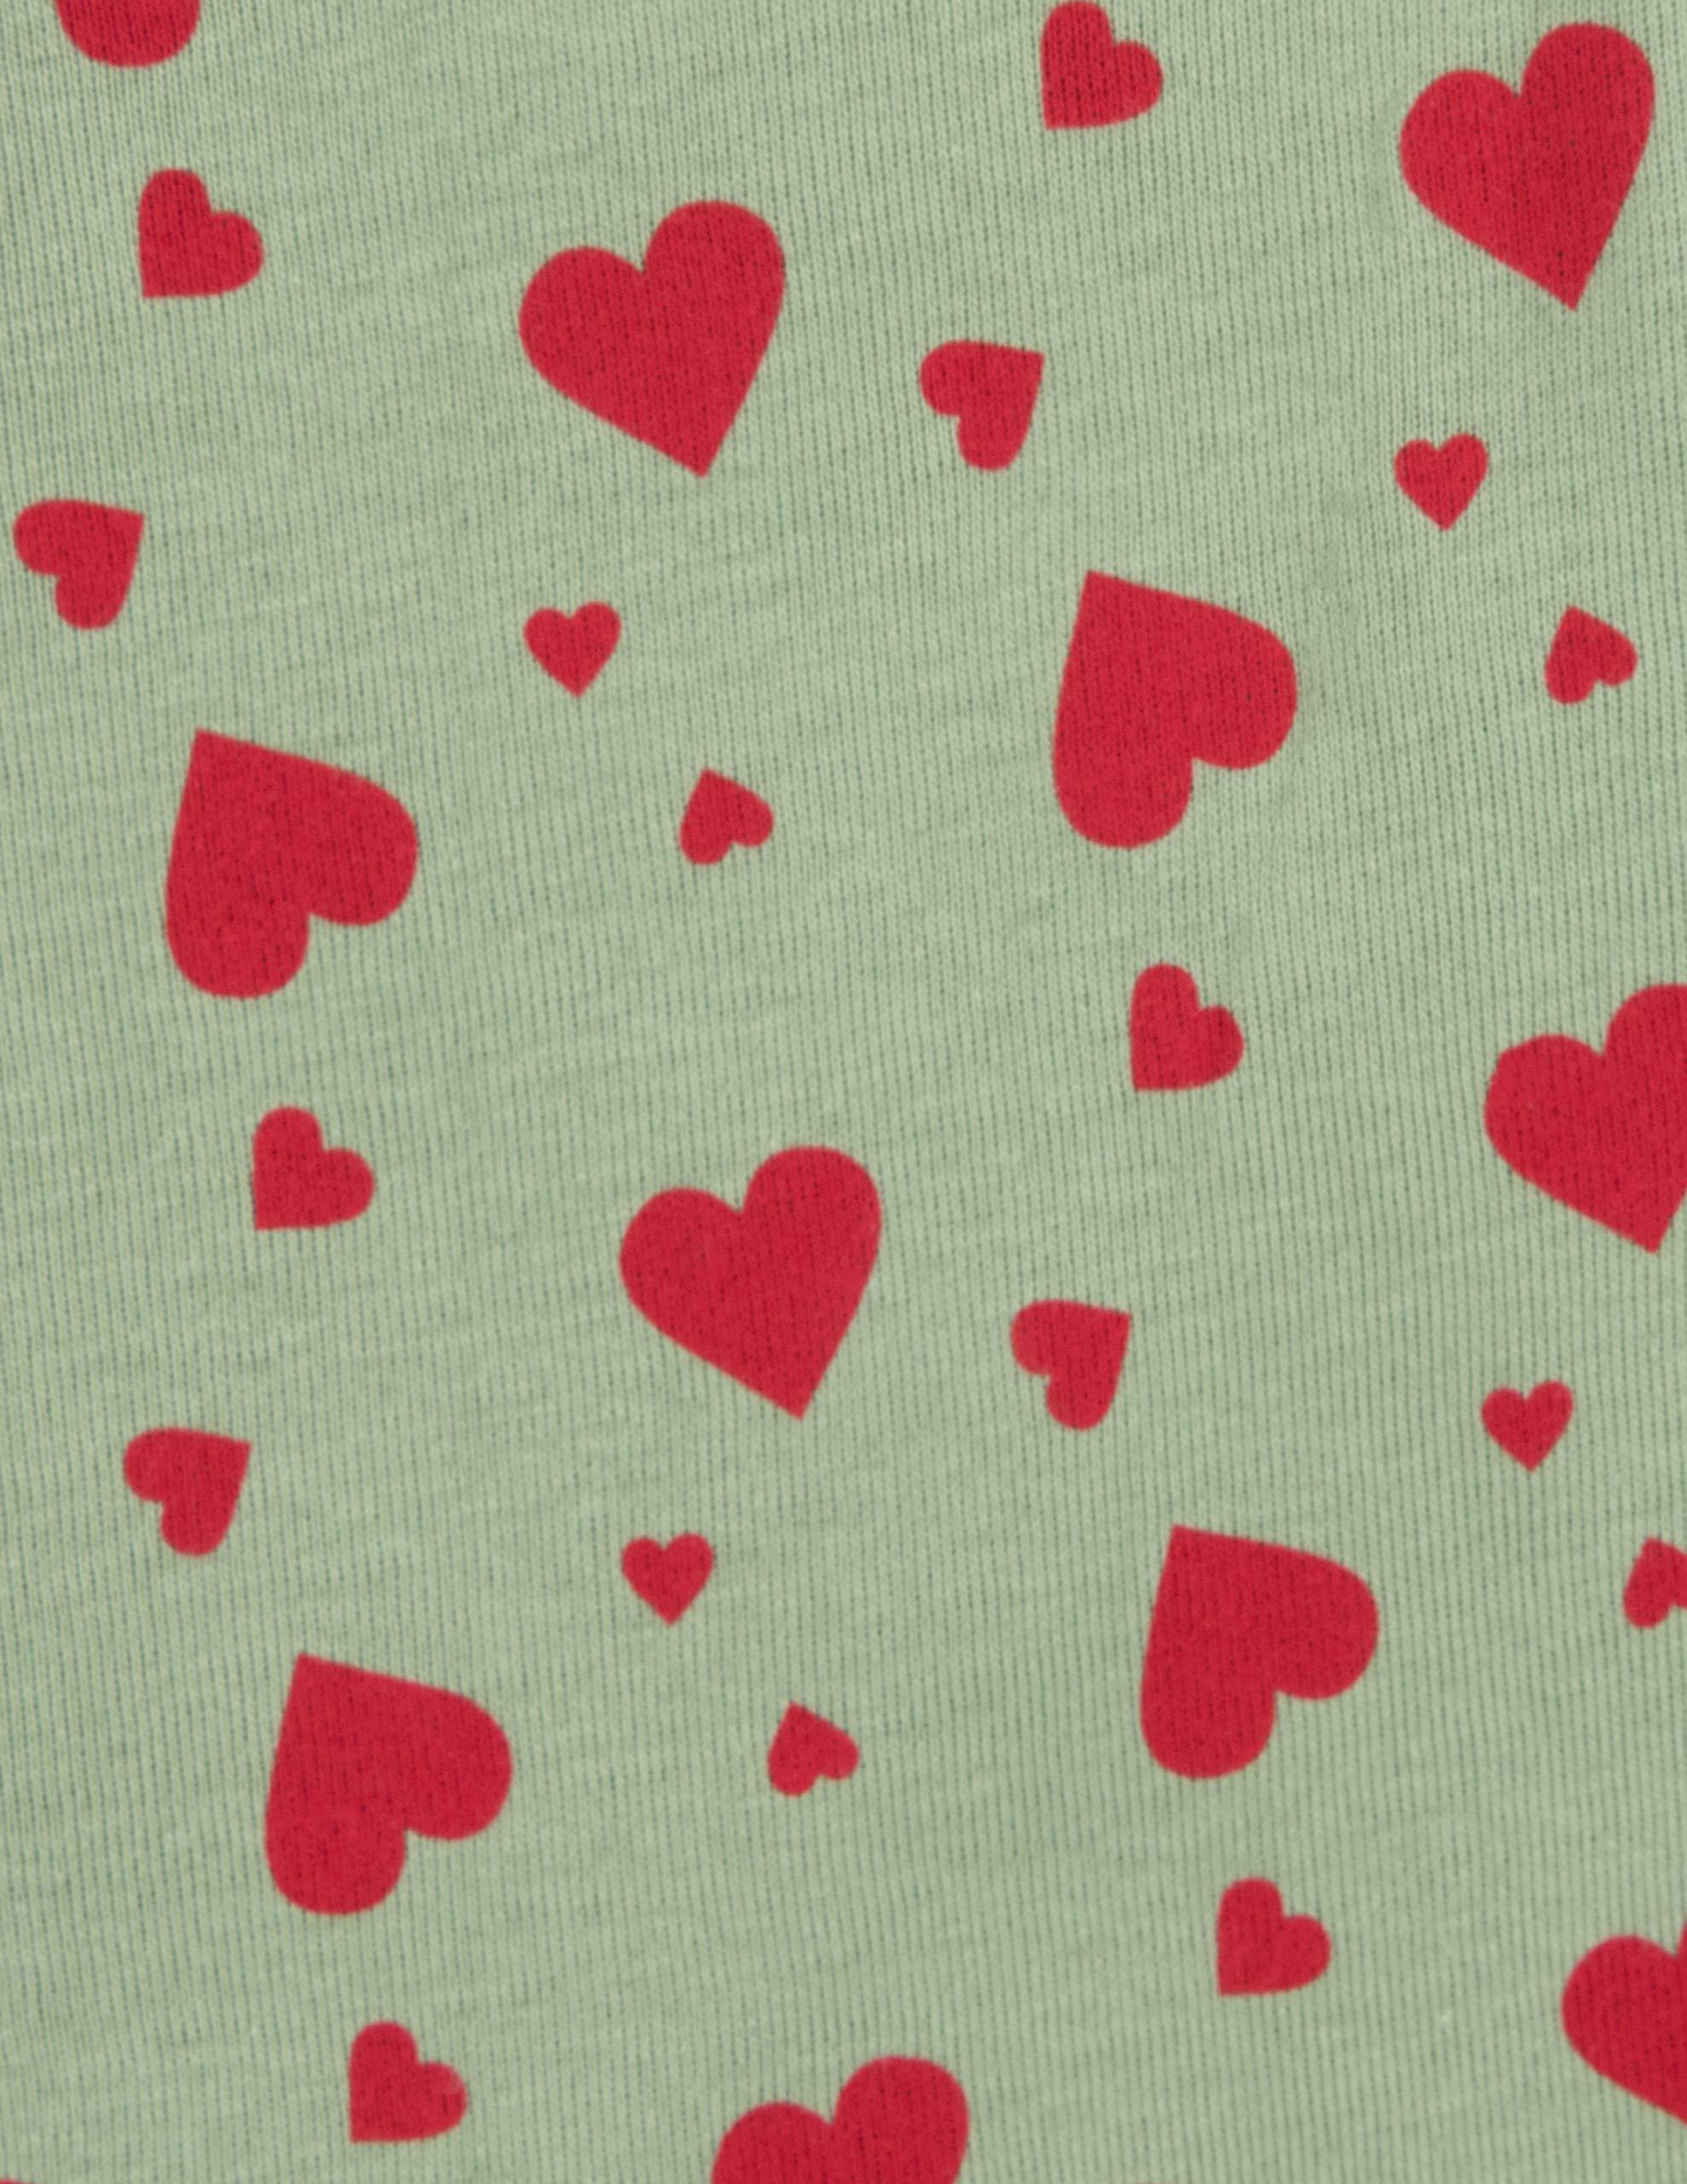 Leveret Kids Pajamas Boys Girls Hearts Birthday 2 Piece pjs set 100/% Cotton